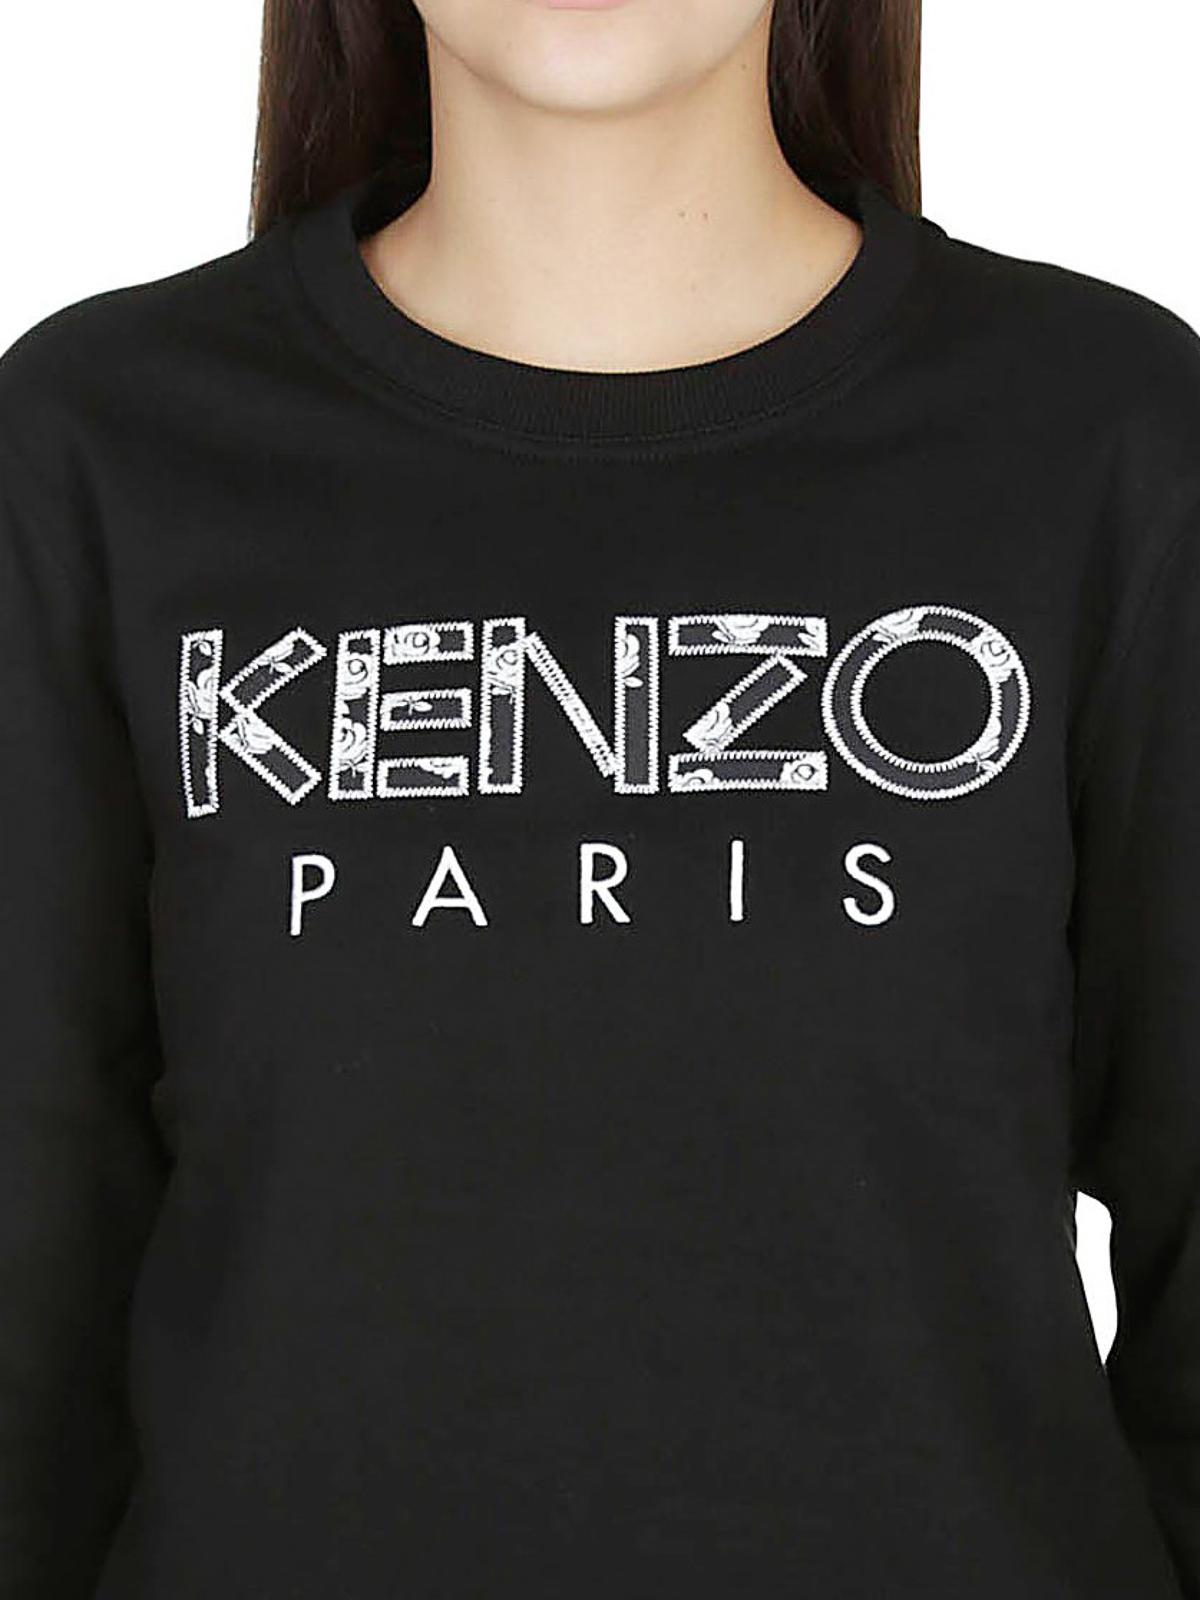 302b0f7729 Kenzo - Kenzo Roses sweatshirt - Sweatshirts & Sweaters ...